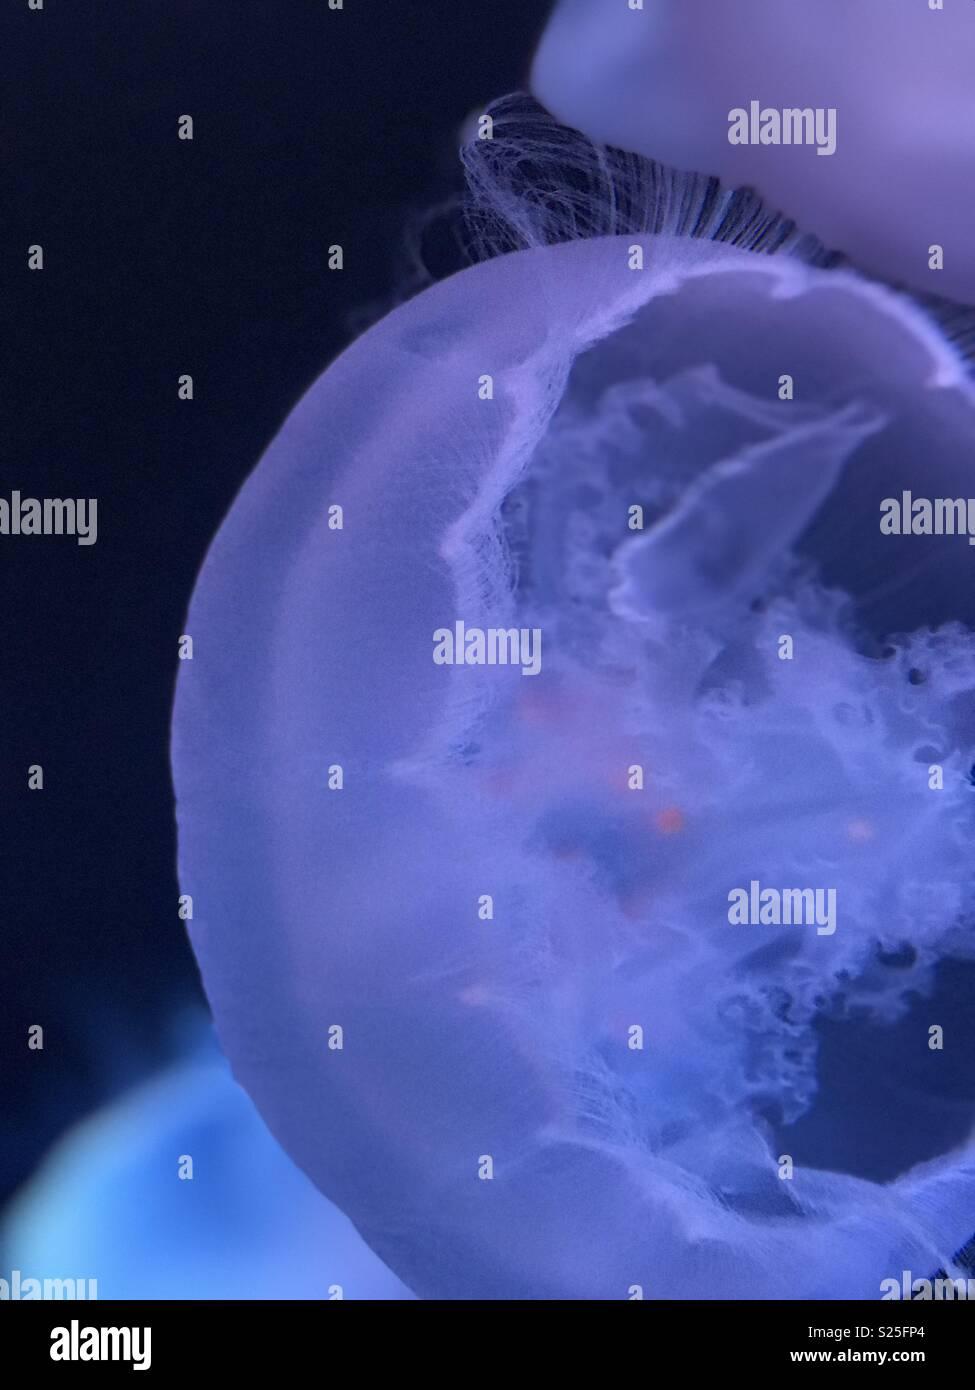 Jellyfish closeup - Stock Image